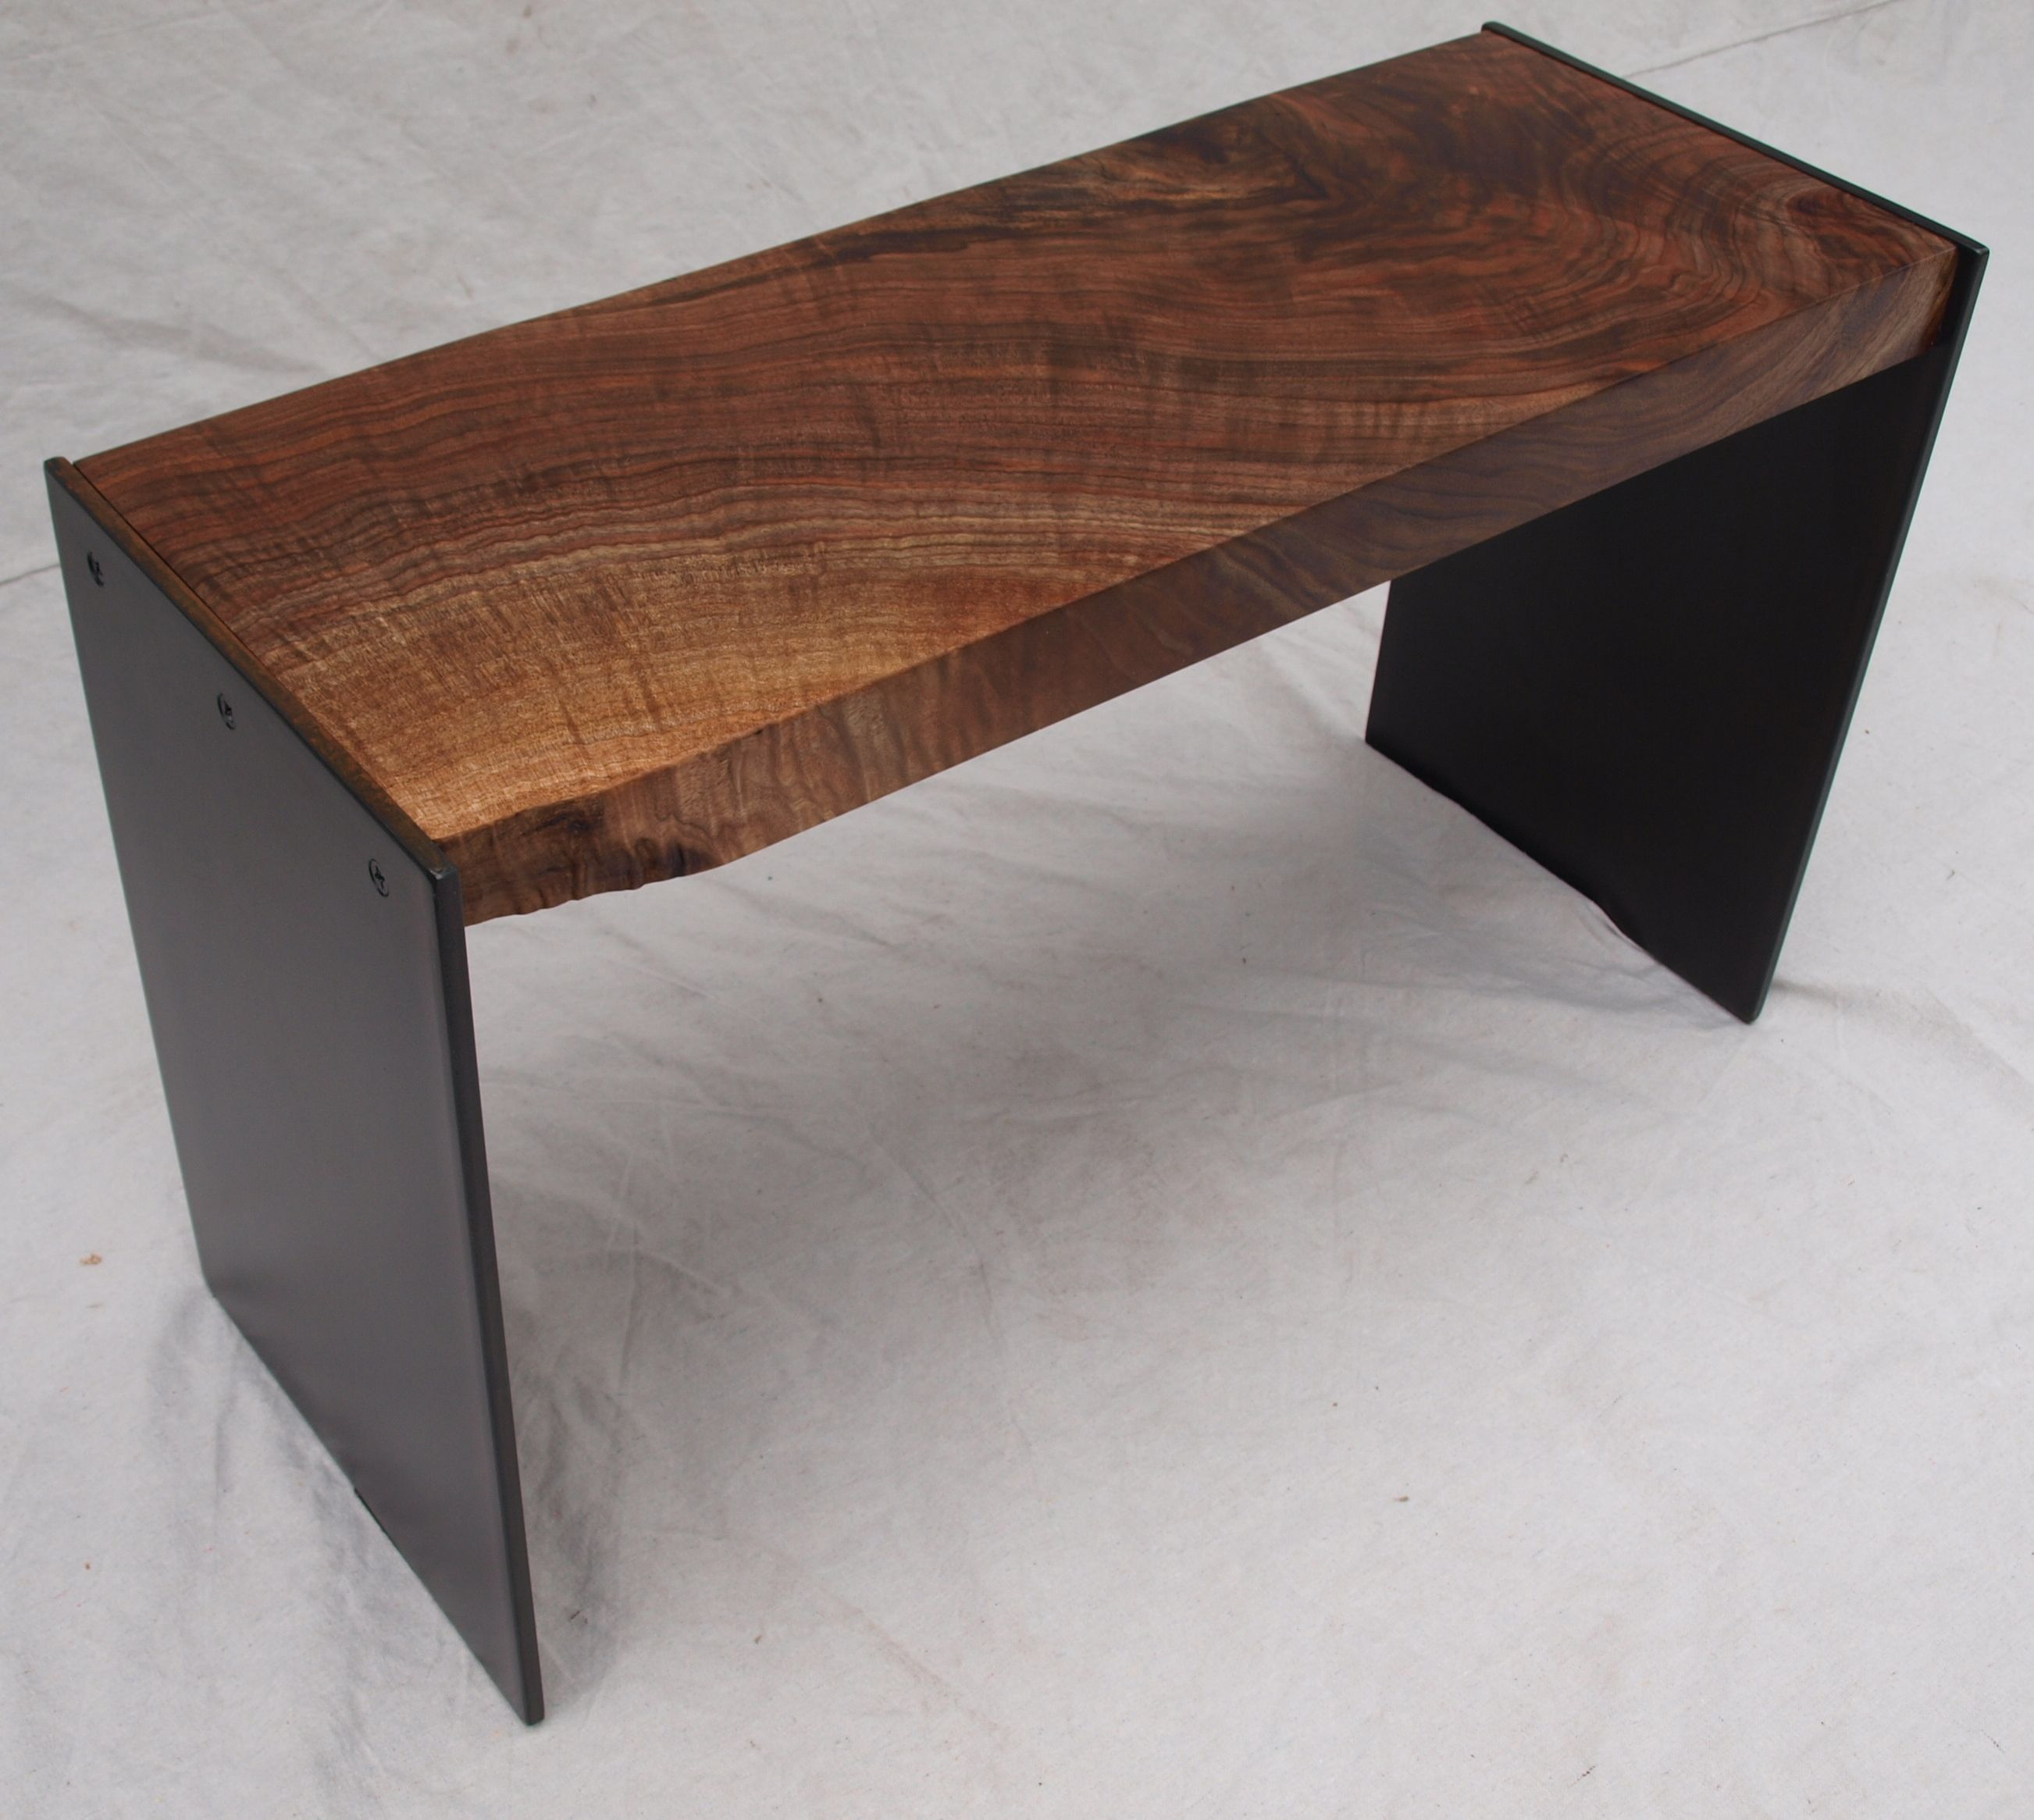 Sensational Walnut Steel Bench Ibusinesslaw Wood Chair Design Ideas Ibusinesslaworg